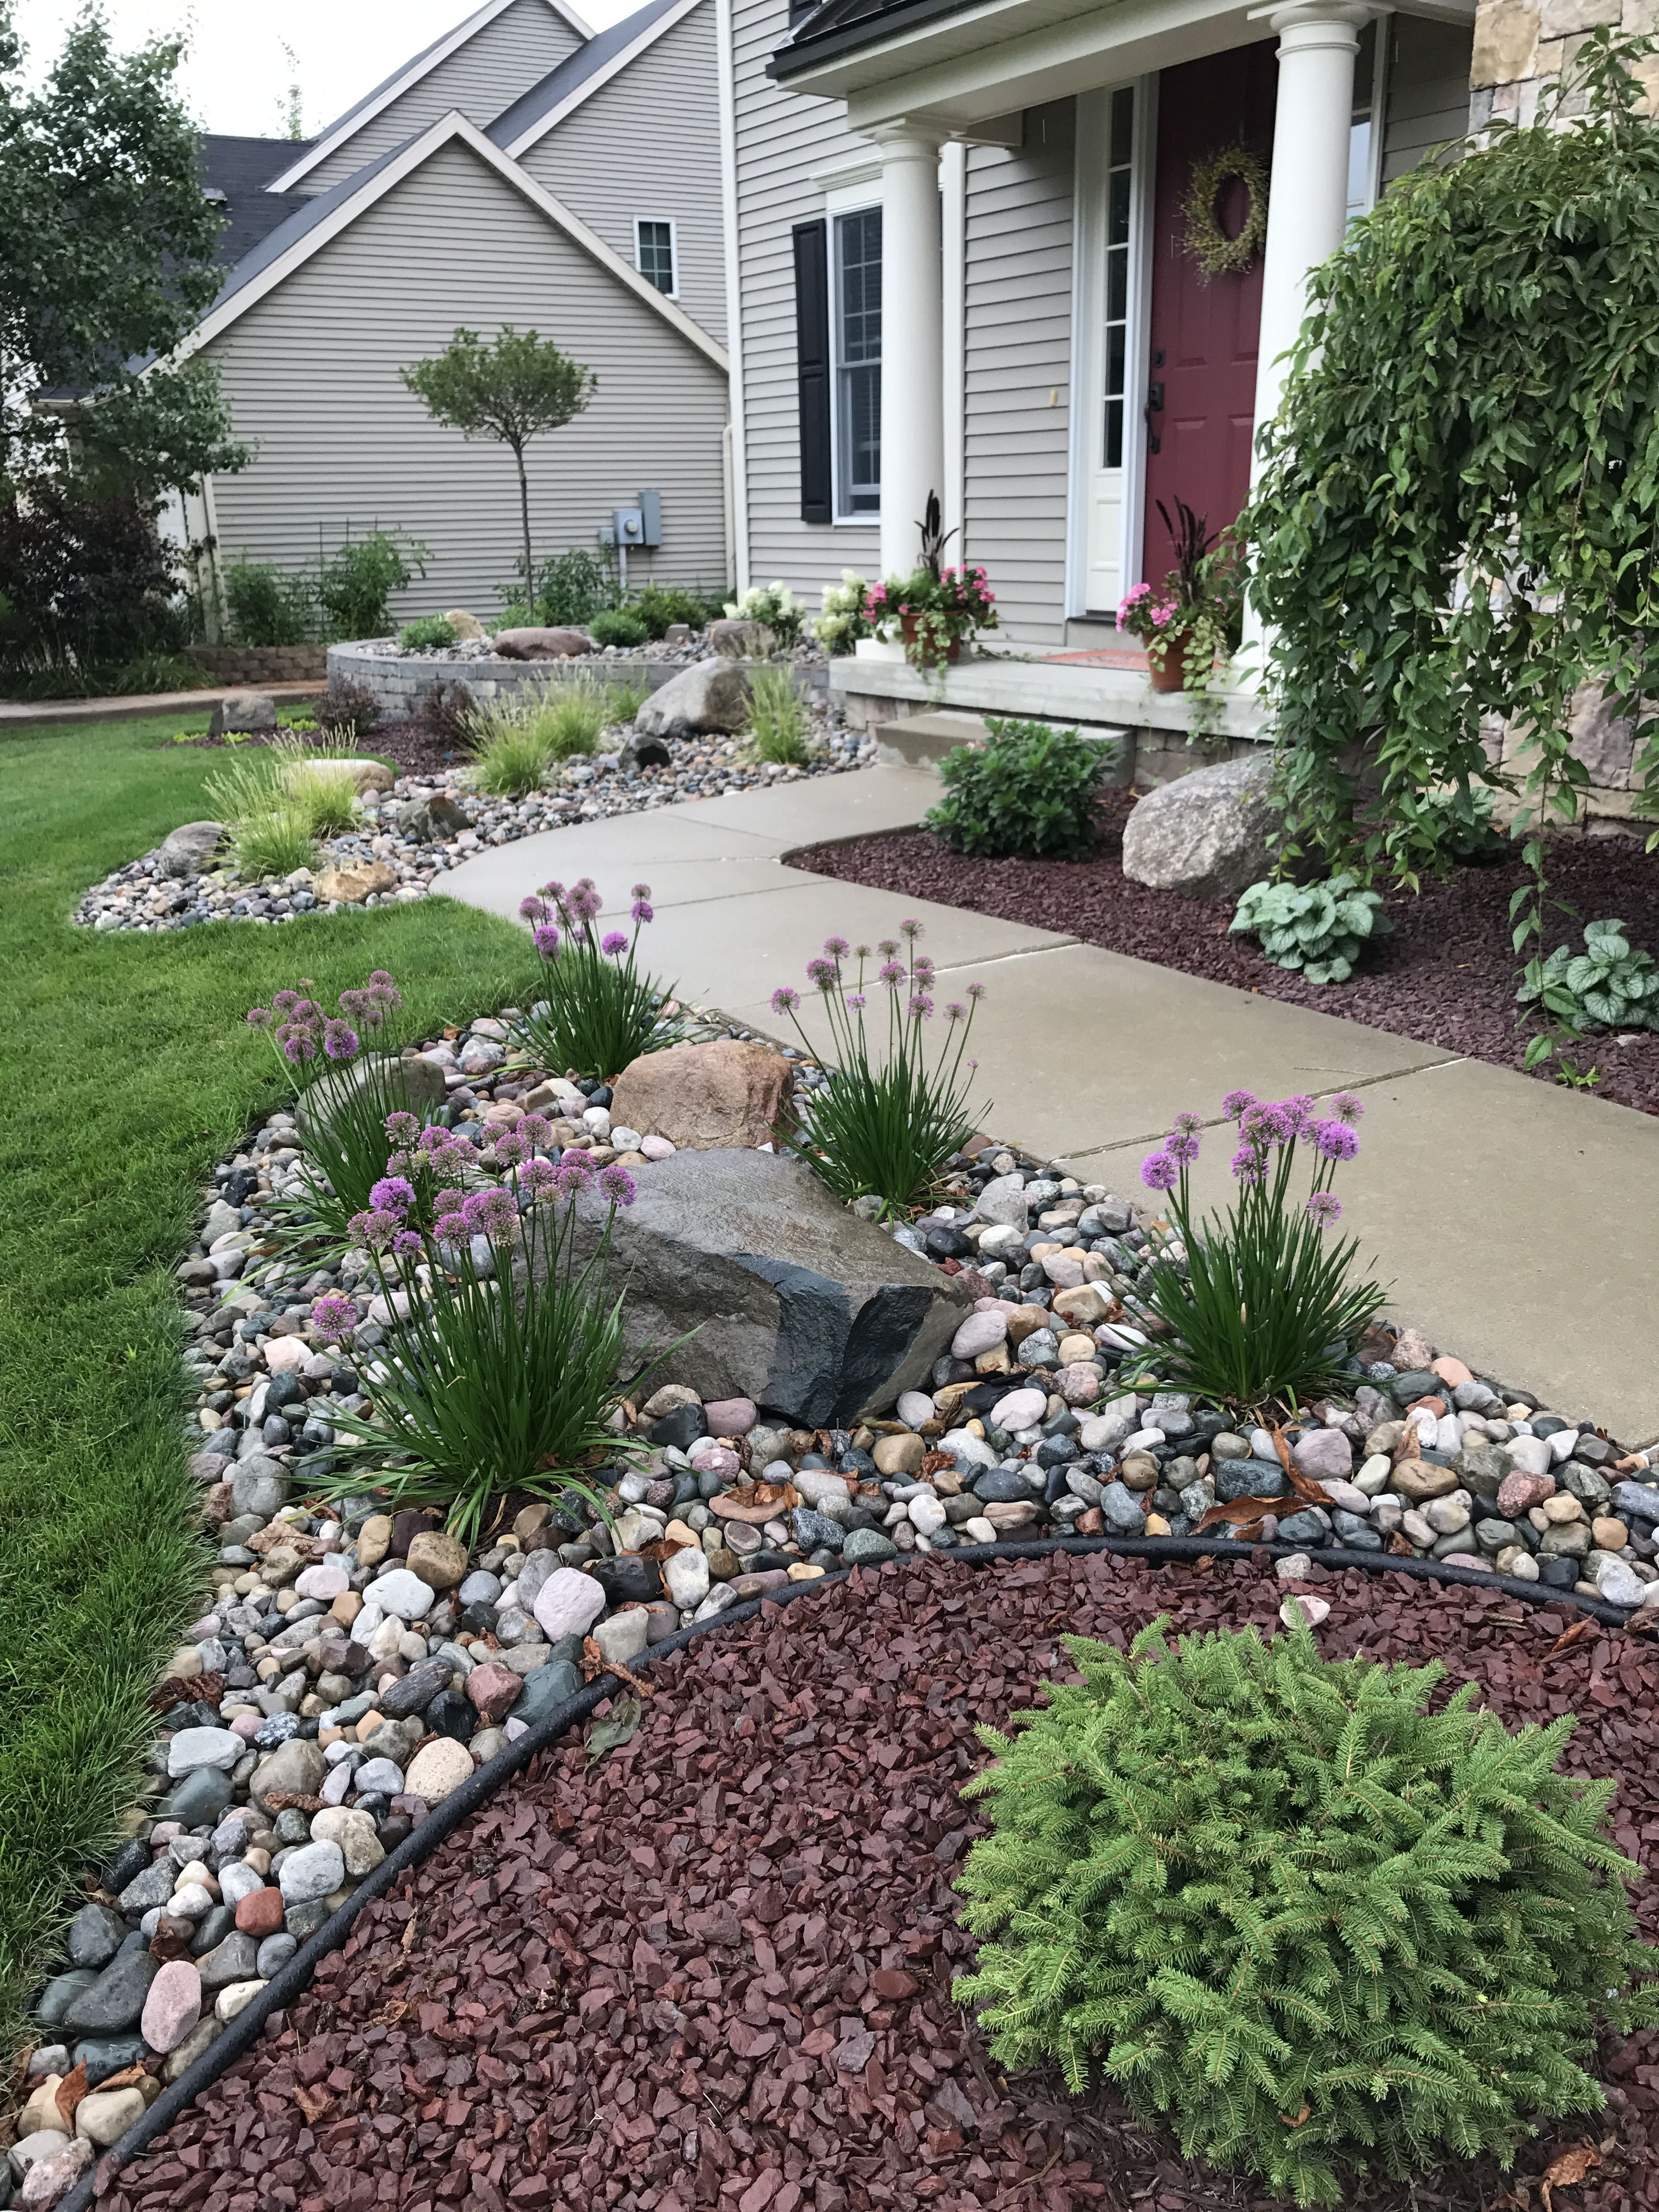 New Front Curb Appeal Flowerbeds Rock Garden Design Pathway Landscaping Front Yard Garden